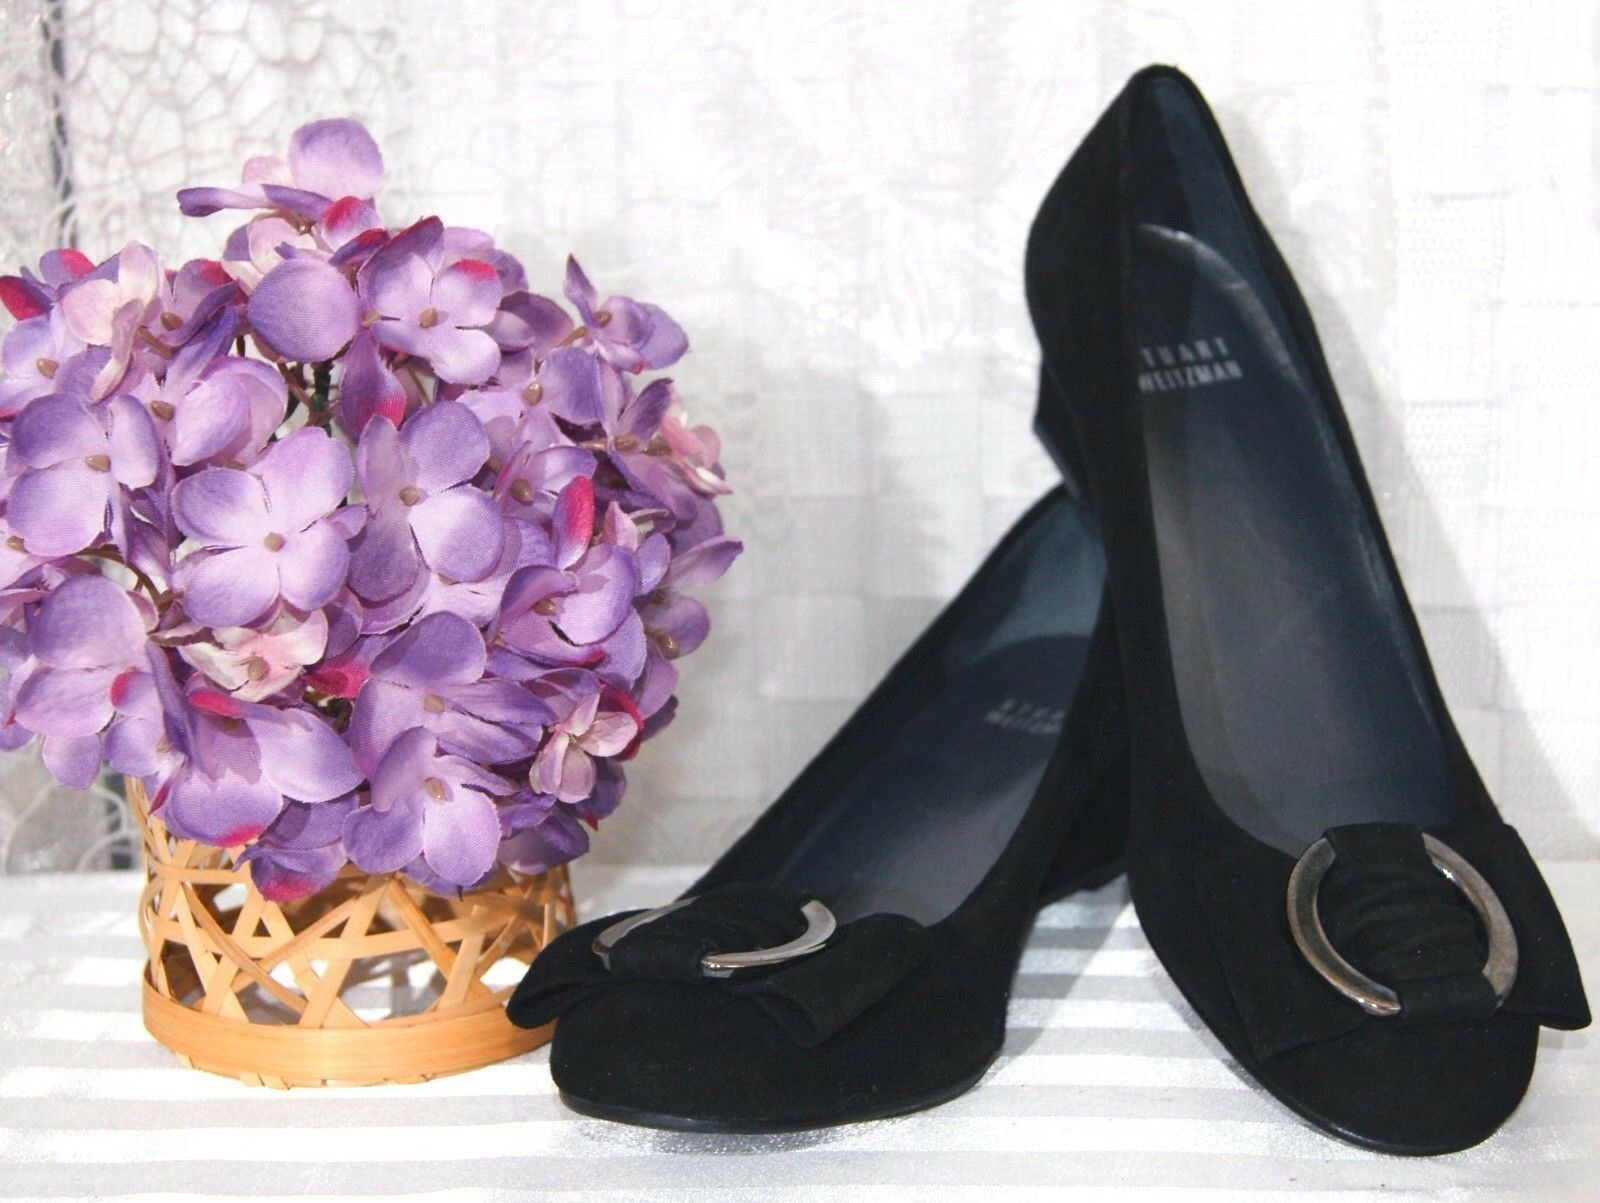 STUART WEITZMAN Damen  Pumps  Wedges dG. 36,5 schwarz Echt Leder Business